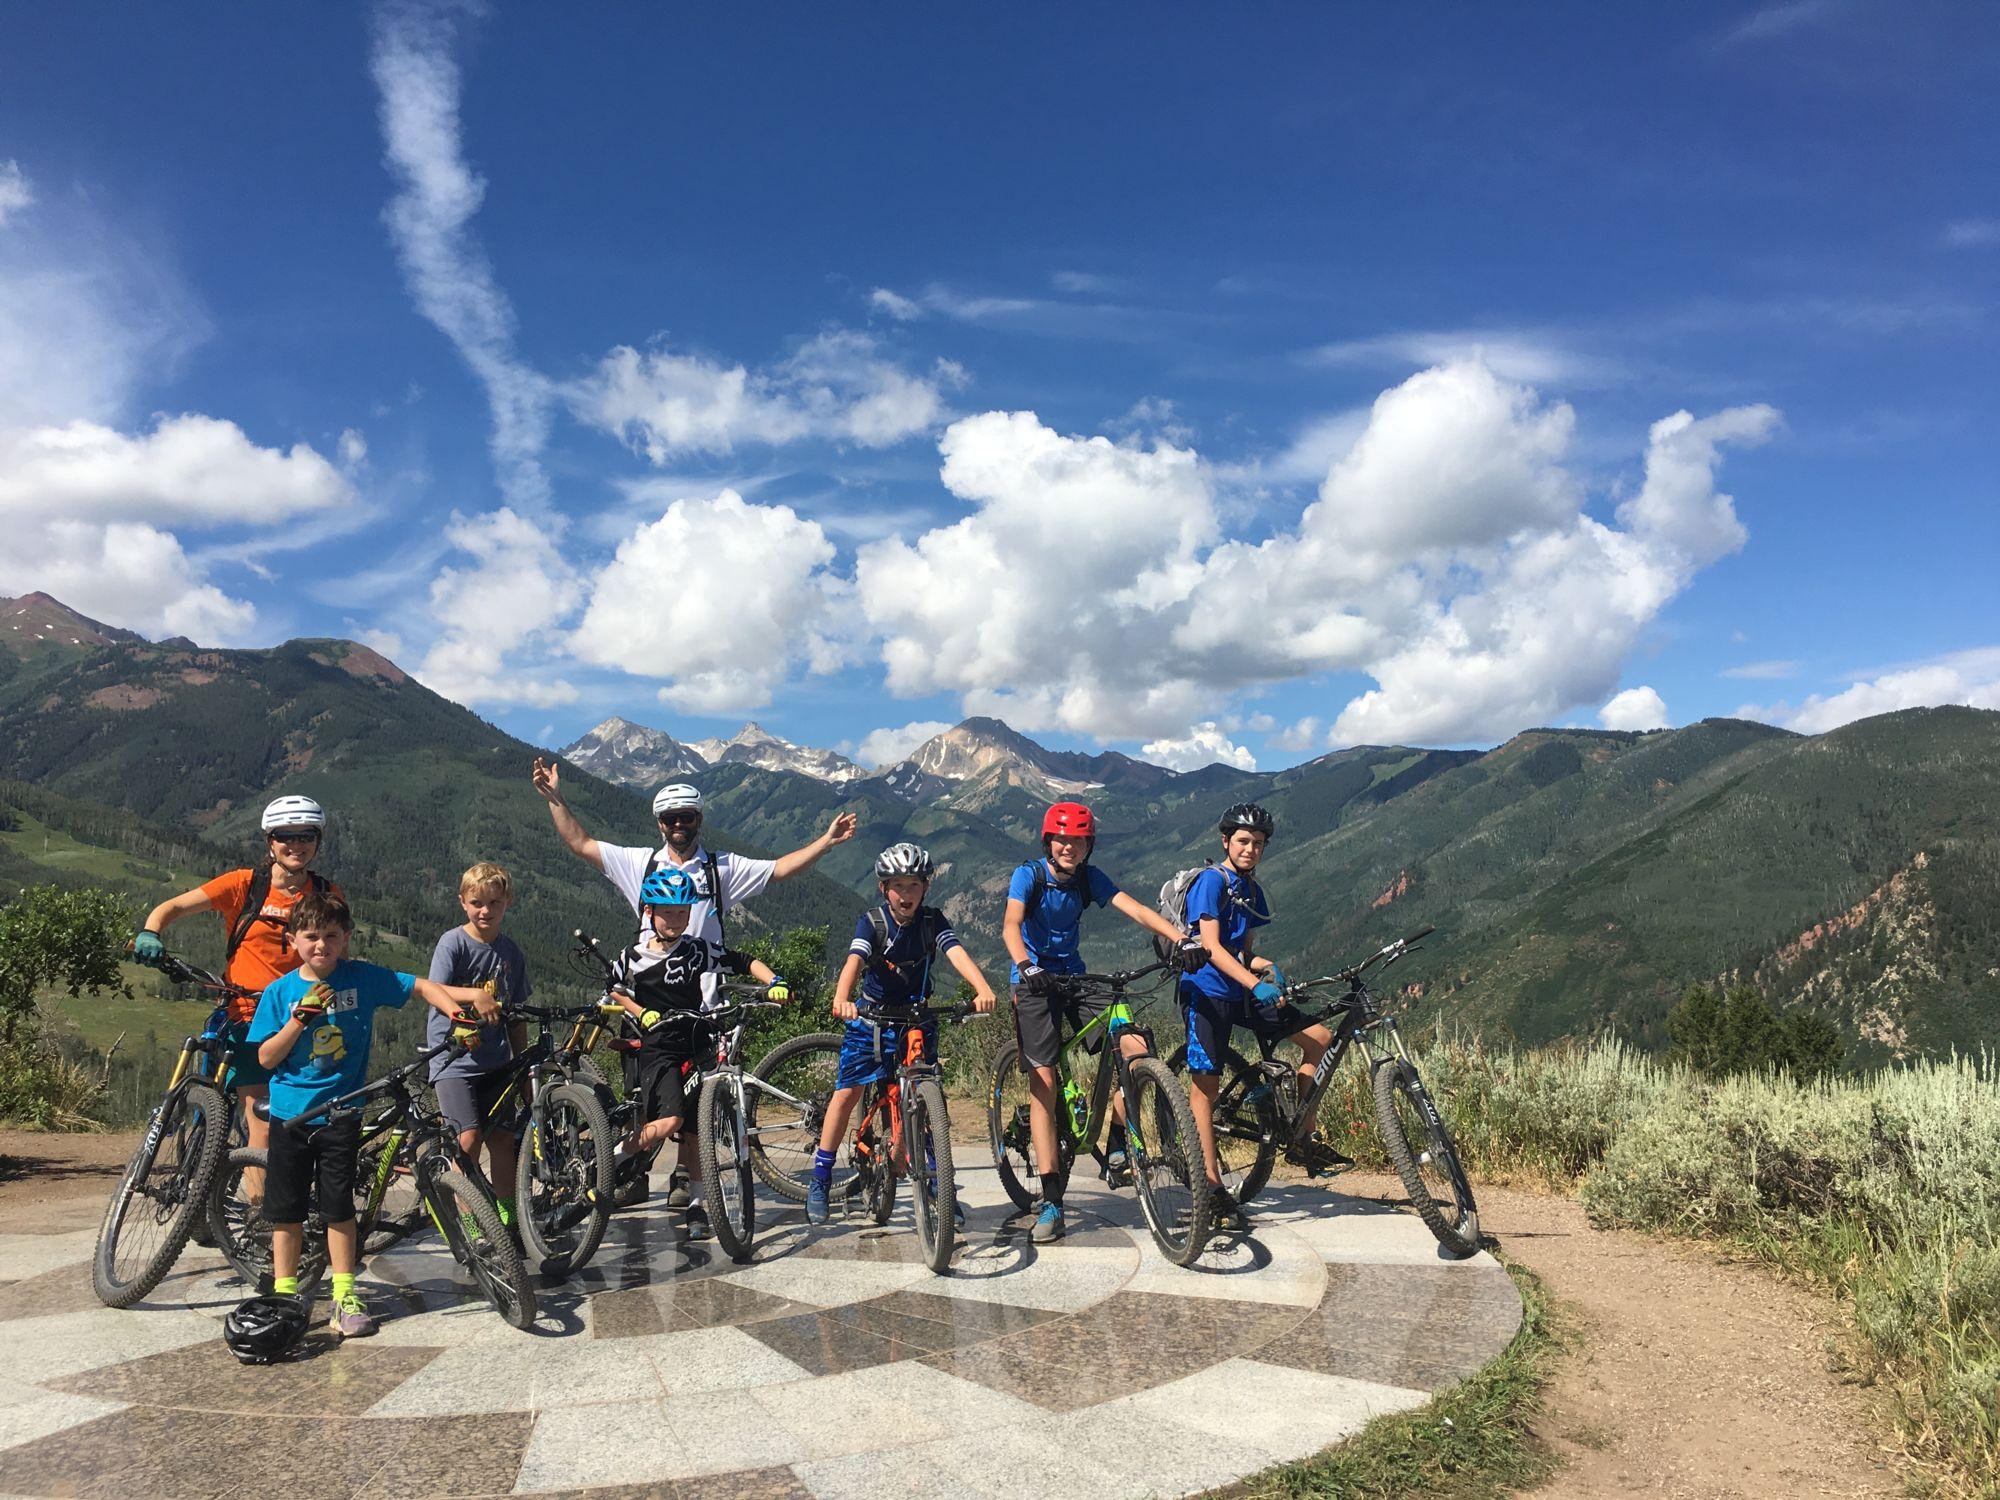 avsc mountain biking